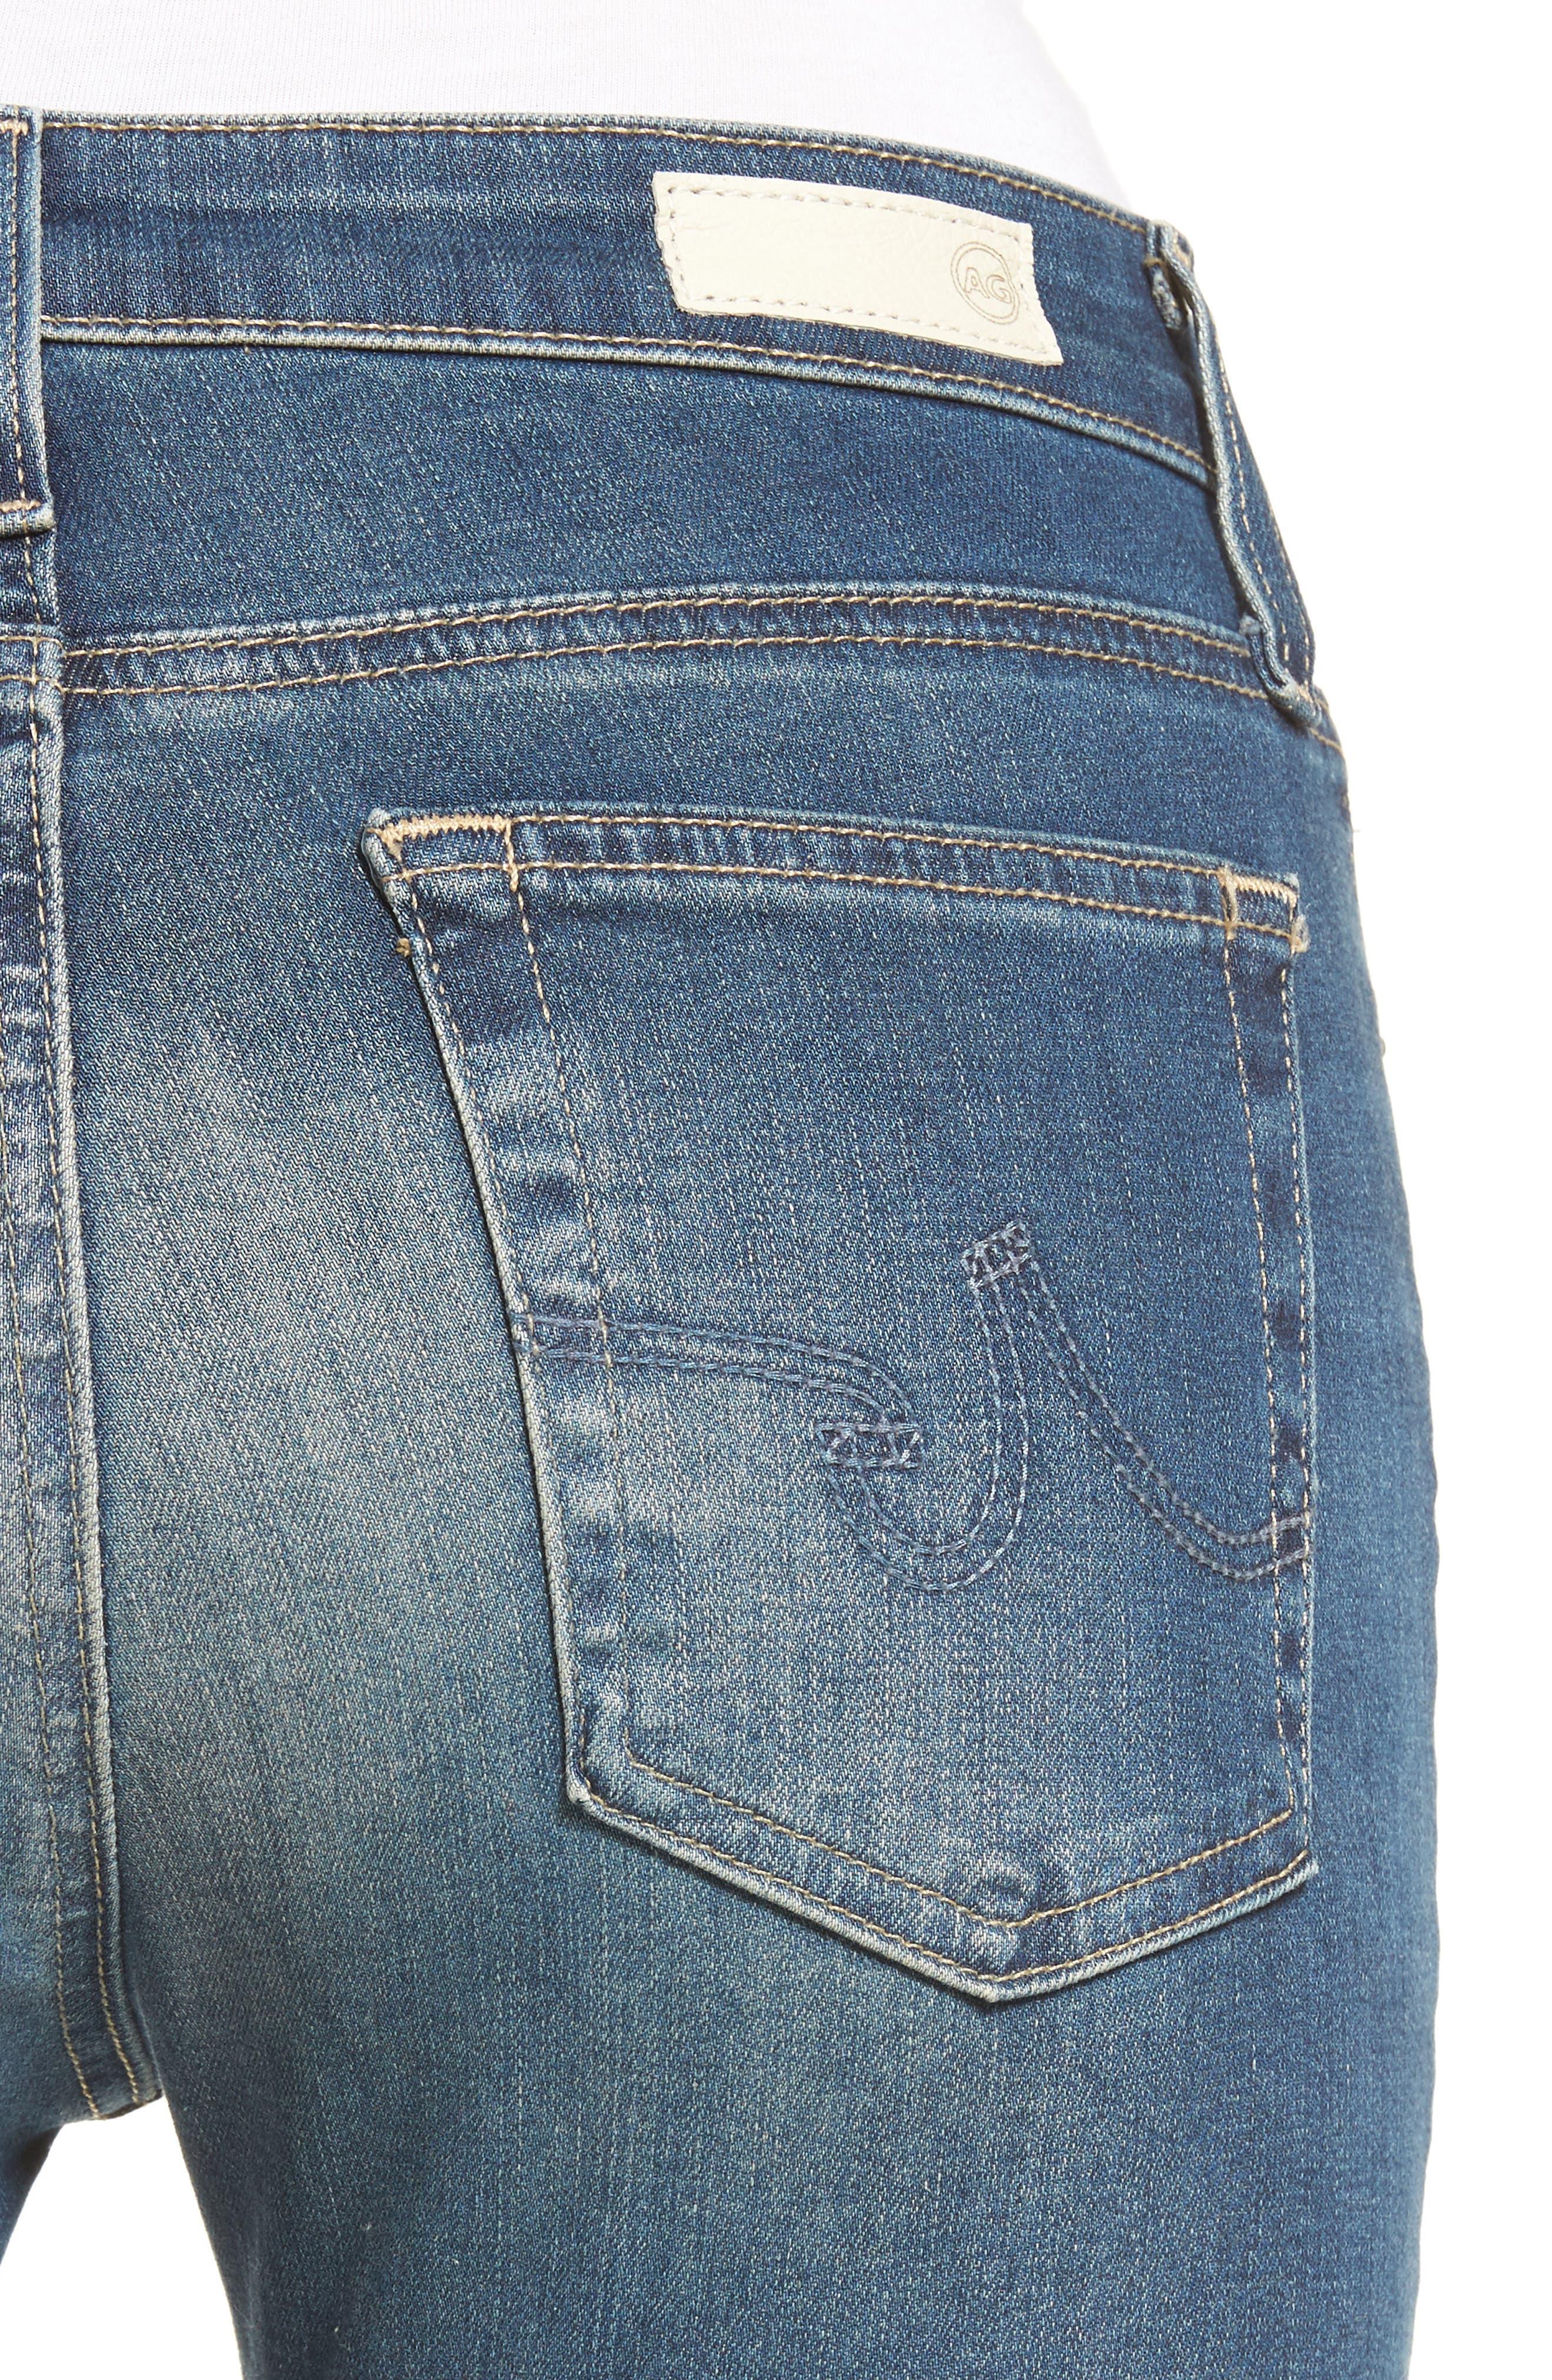 'The Farrah' High Rise Skinny Jeans,                             Alternate thumbnail 33, color,